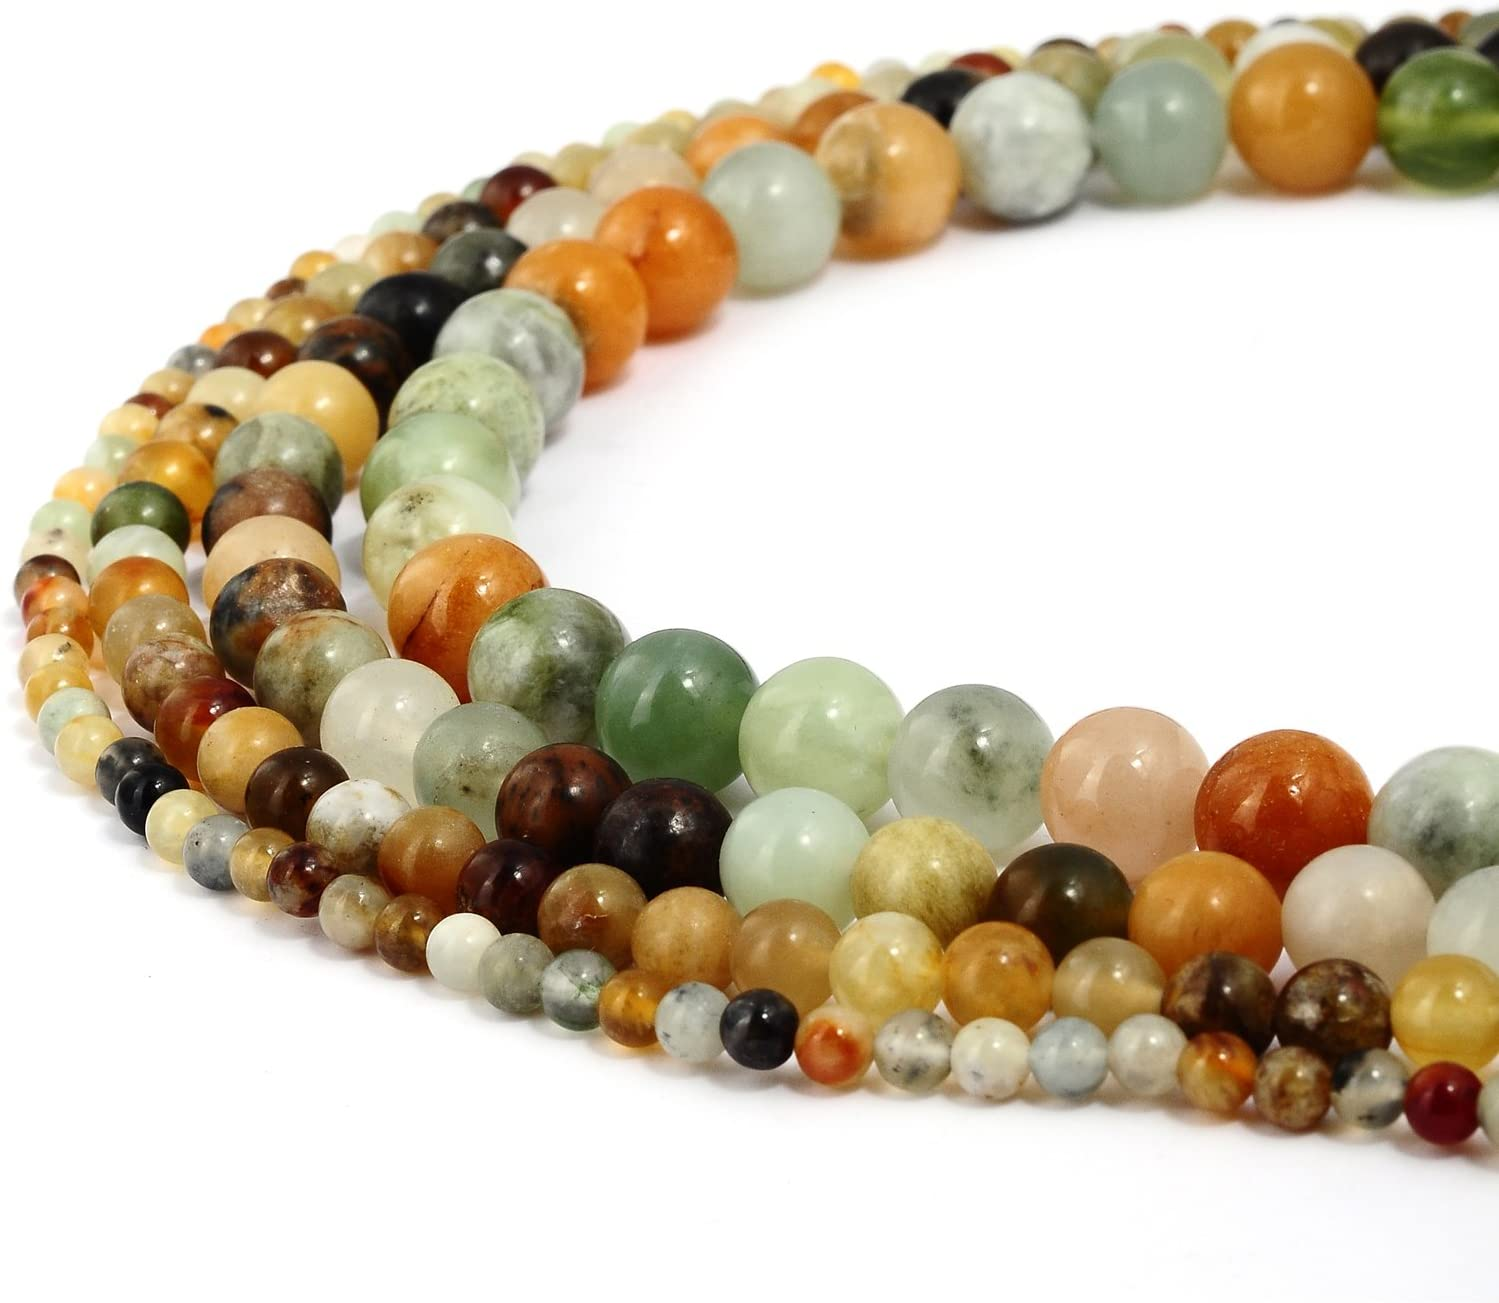 Pcs Dyed  Gemstones Jewellery Making Crafts Mashan Jade Round Beads 6mm Blue 60